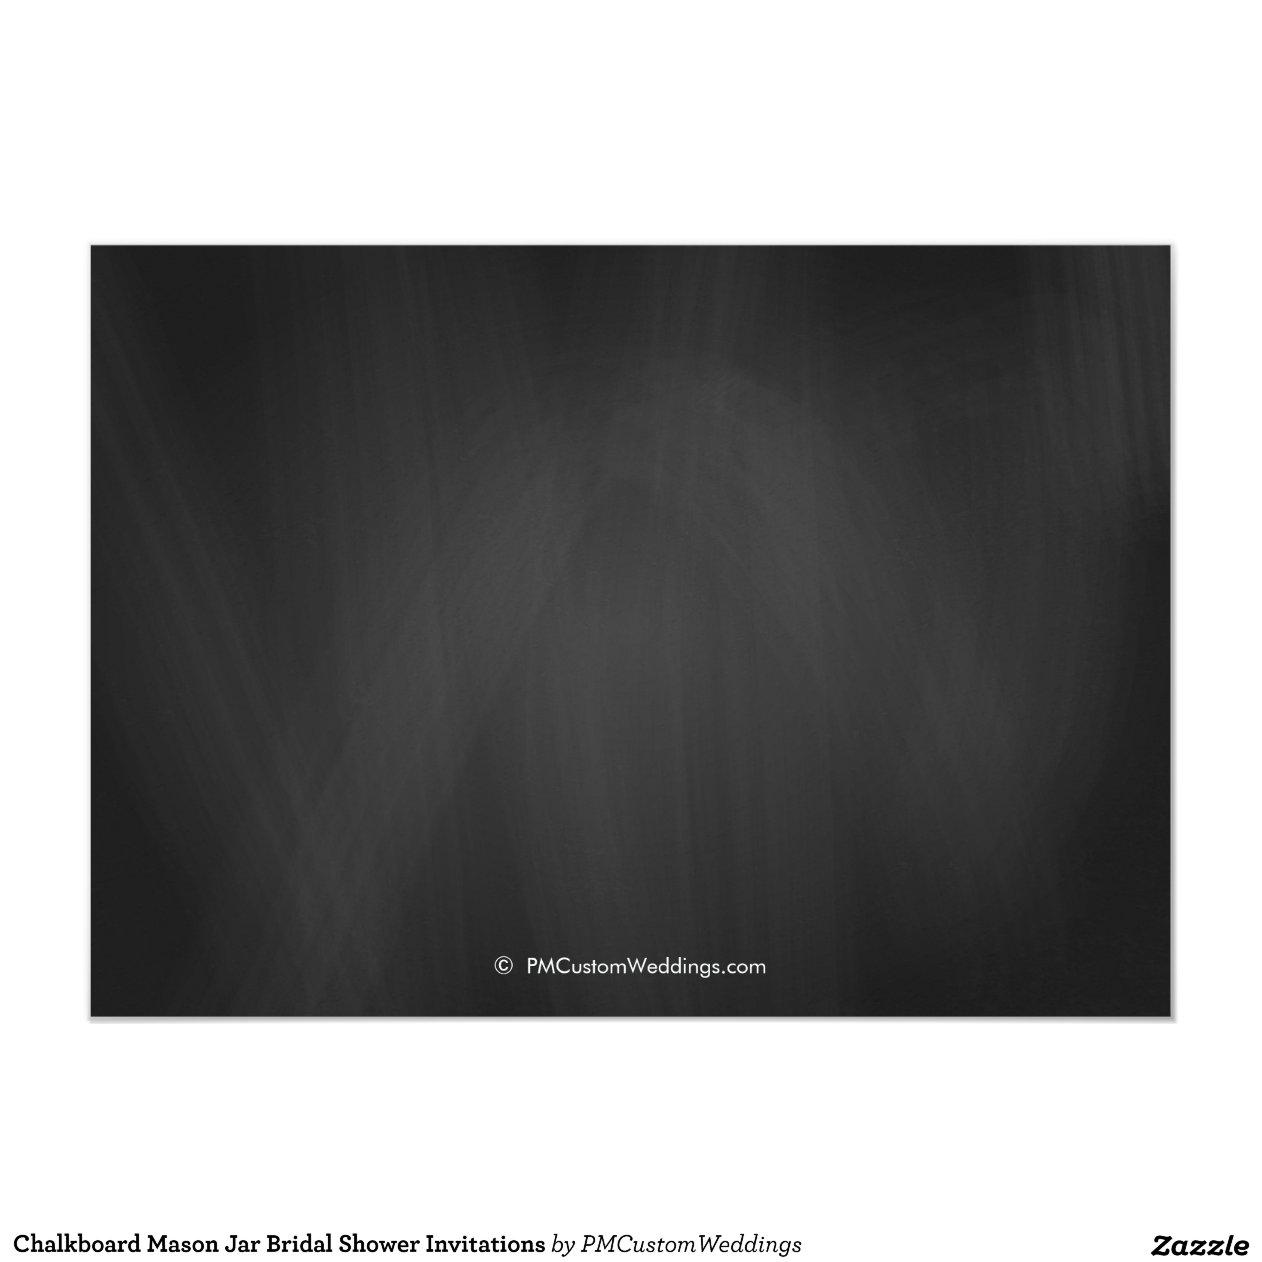 Chalkboard Mason Jar Bridal Chalkboard Mason Jar Bridal Shower ... Xenotransplantation Primates